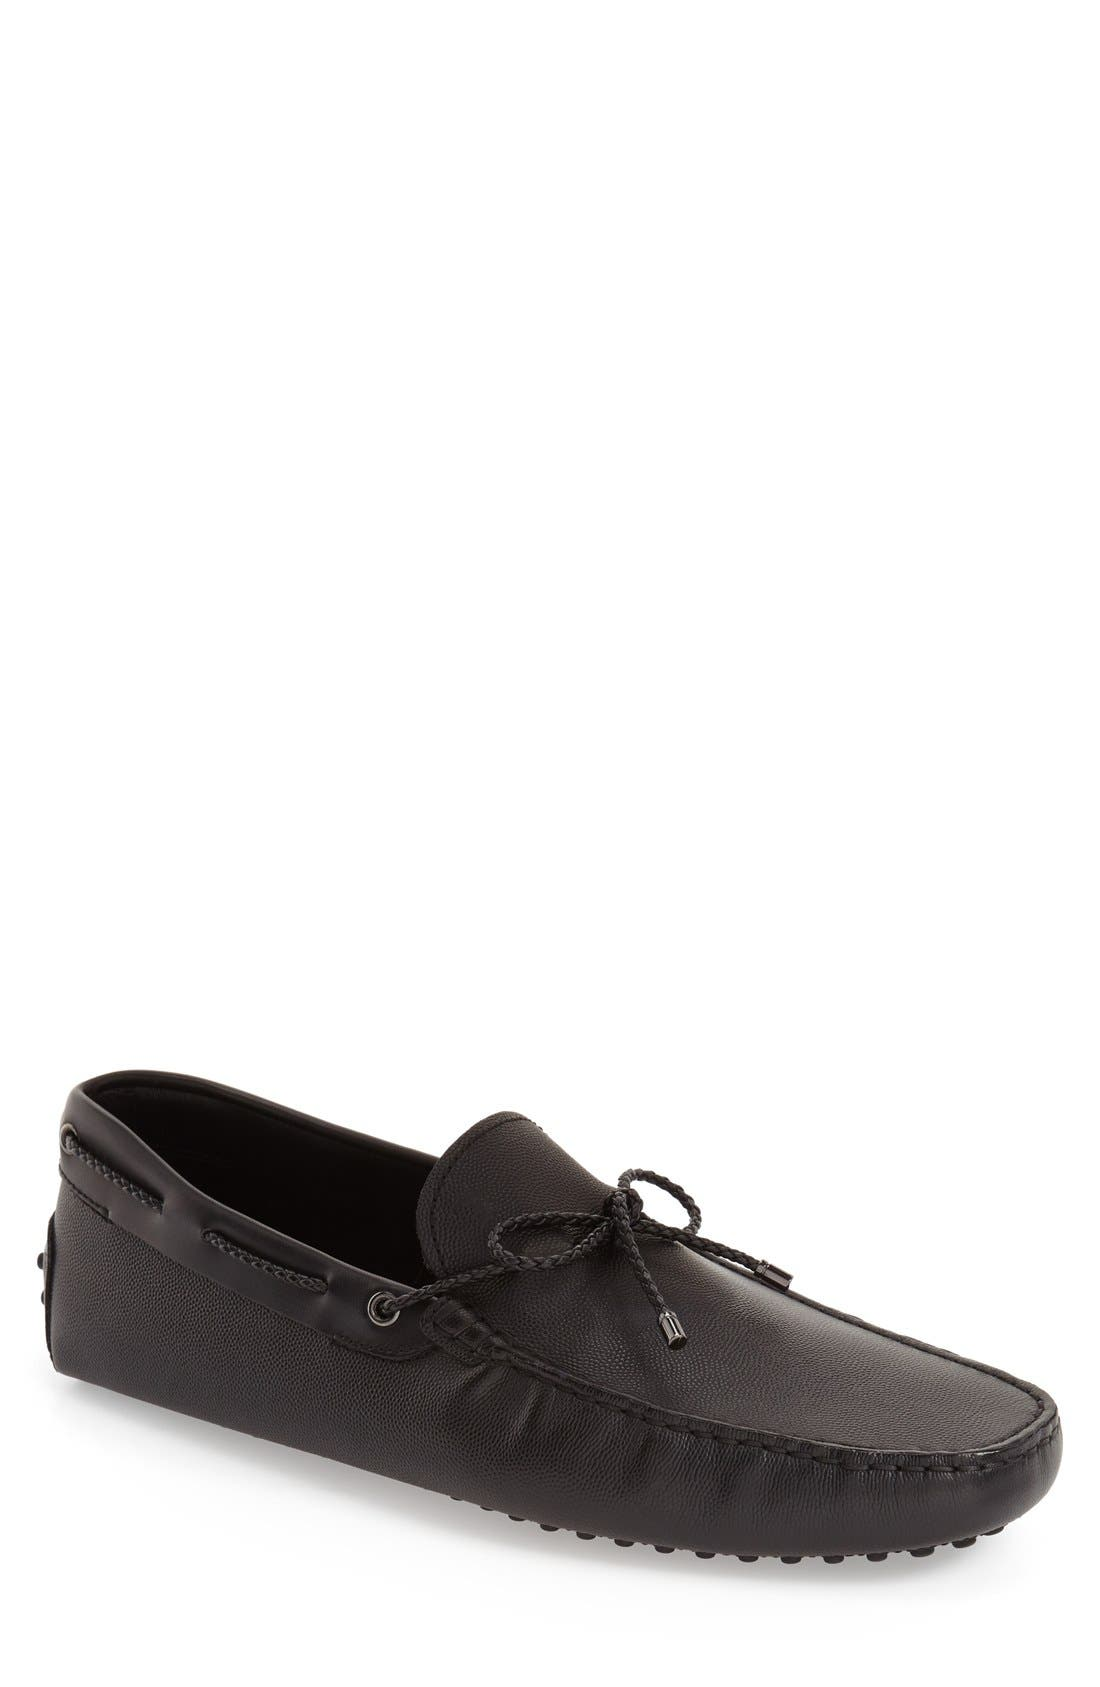 Alternate Image 1 Selected - Tods Gommini Driving Shoe (Men)